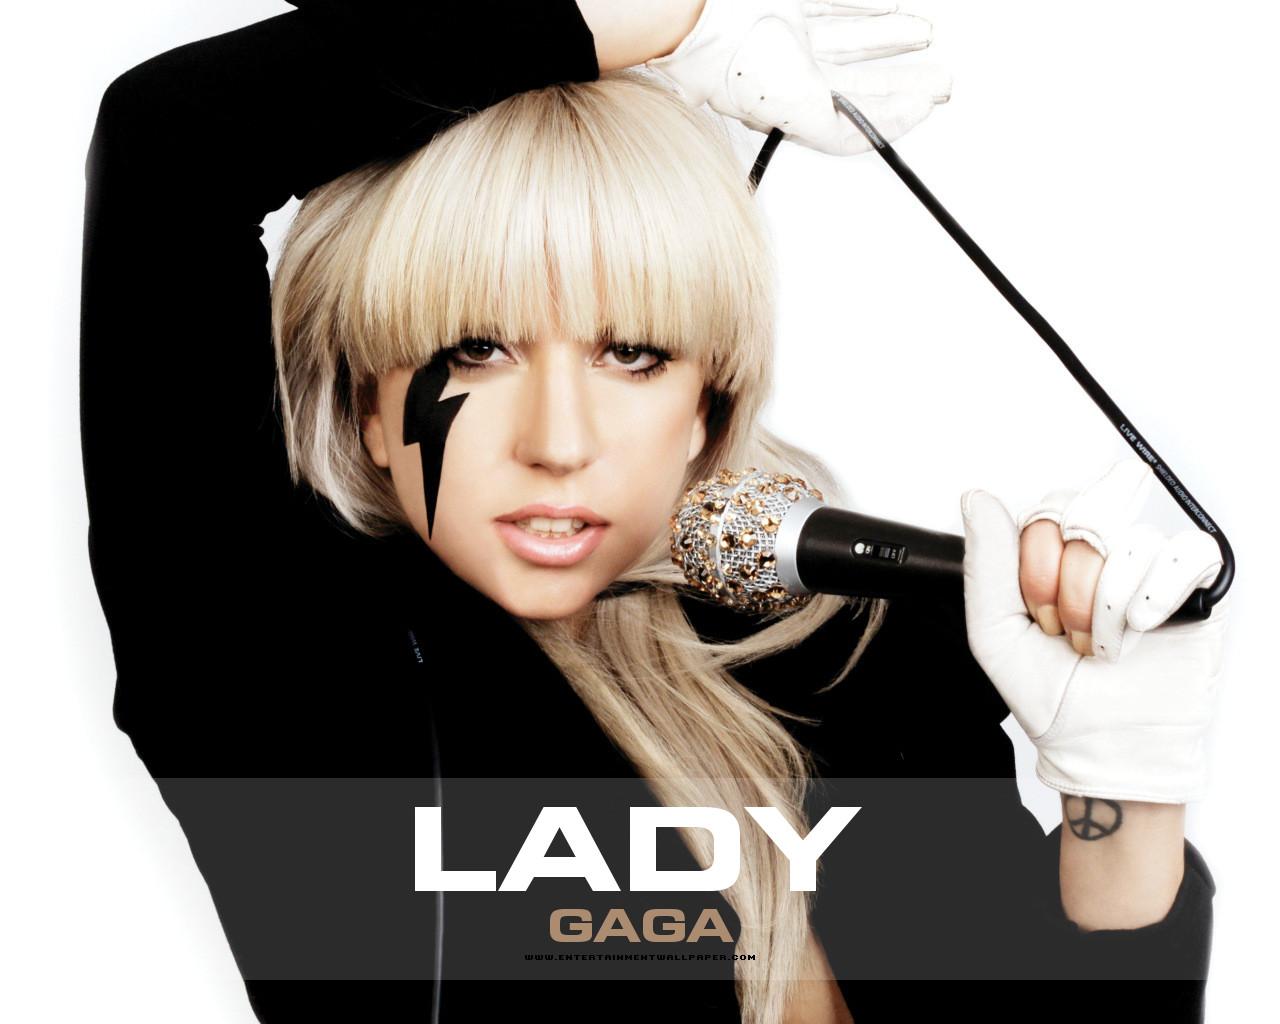 http://3.bp.blogspot.com/_9NSTuh308hk/THcUmQU5MbI/AAAAAAAAAWI/uDRRWqQi7SM/s1600/lady_gaga.jpg